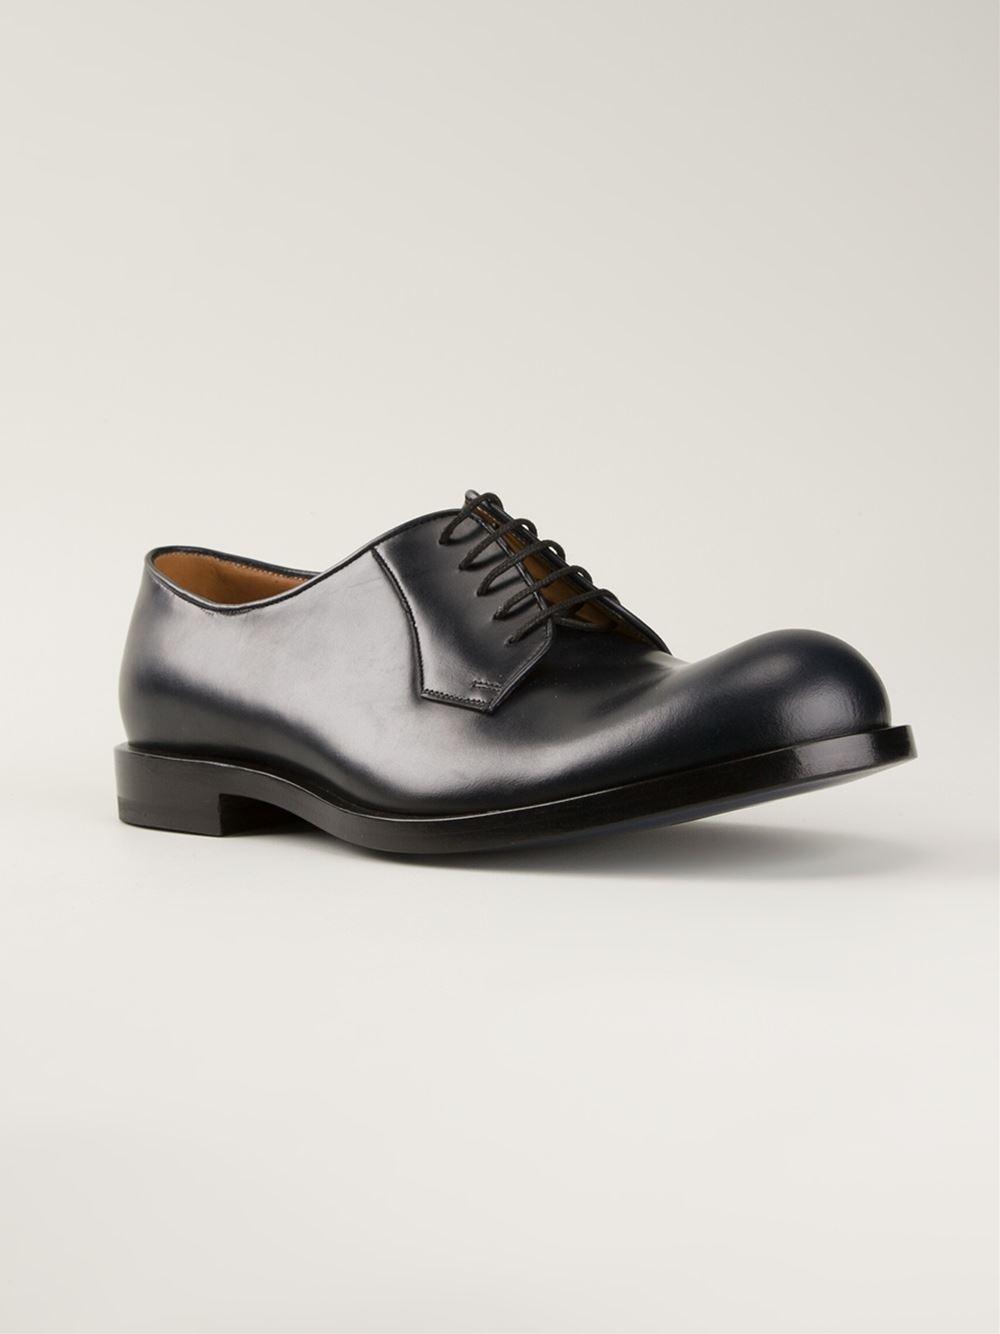 30fc828b8b1 Lyst - Jil Sander Classic Derby Shoes in Blue for Men